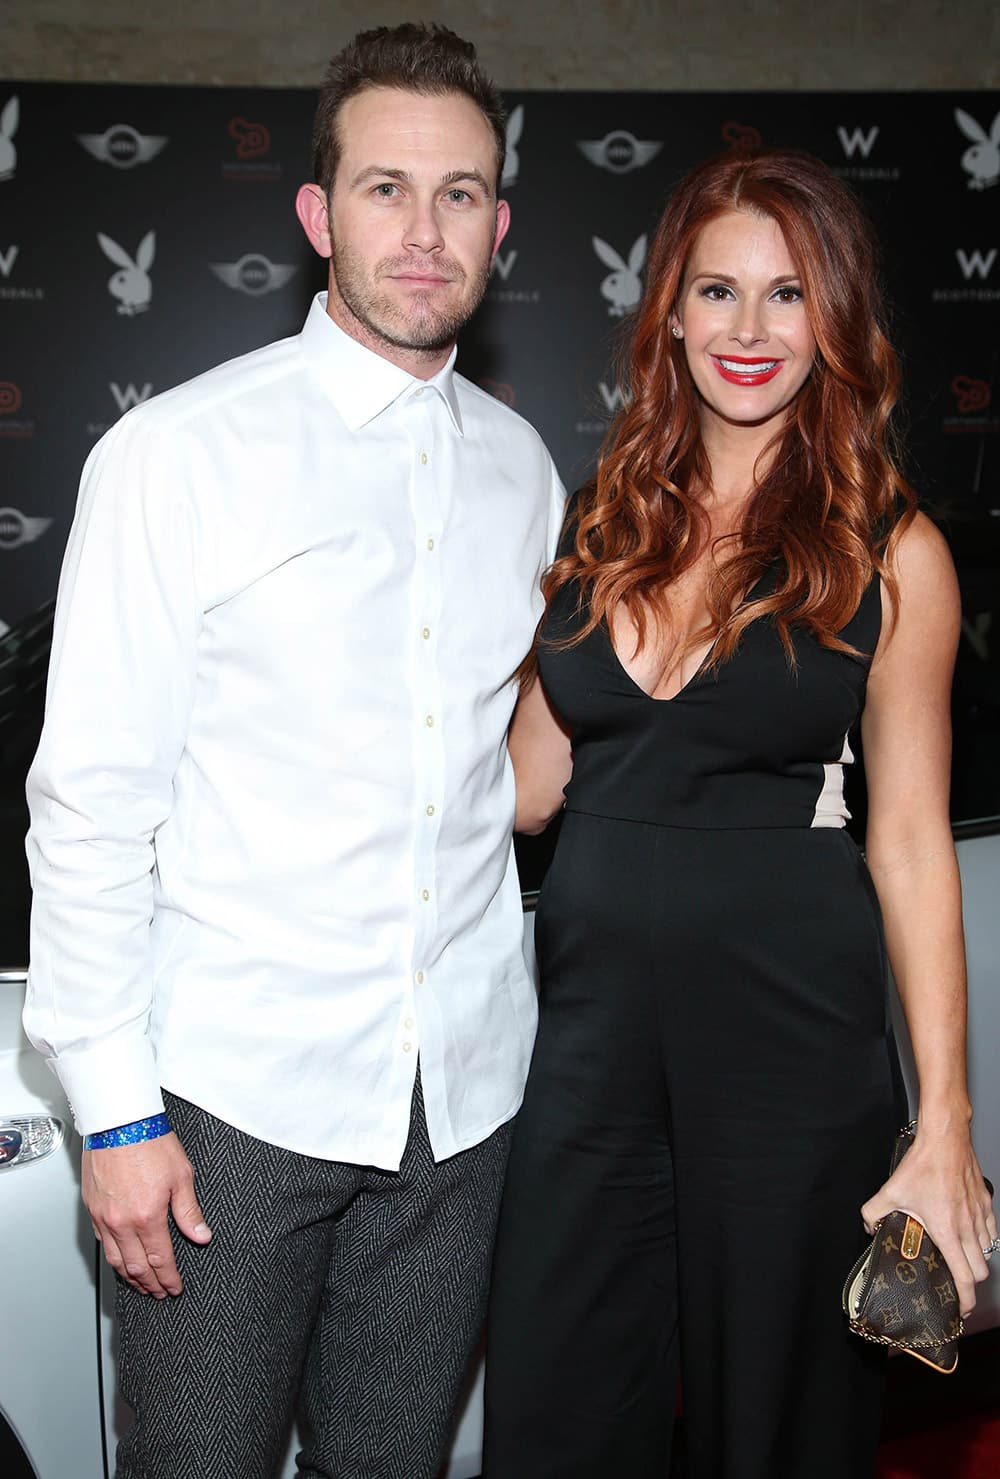 Evan Longoria and Jaime Edmondson arrive at the Playboy Super Bowl XLIX Party in Scottsdale, Ariz.